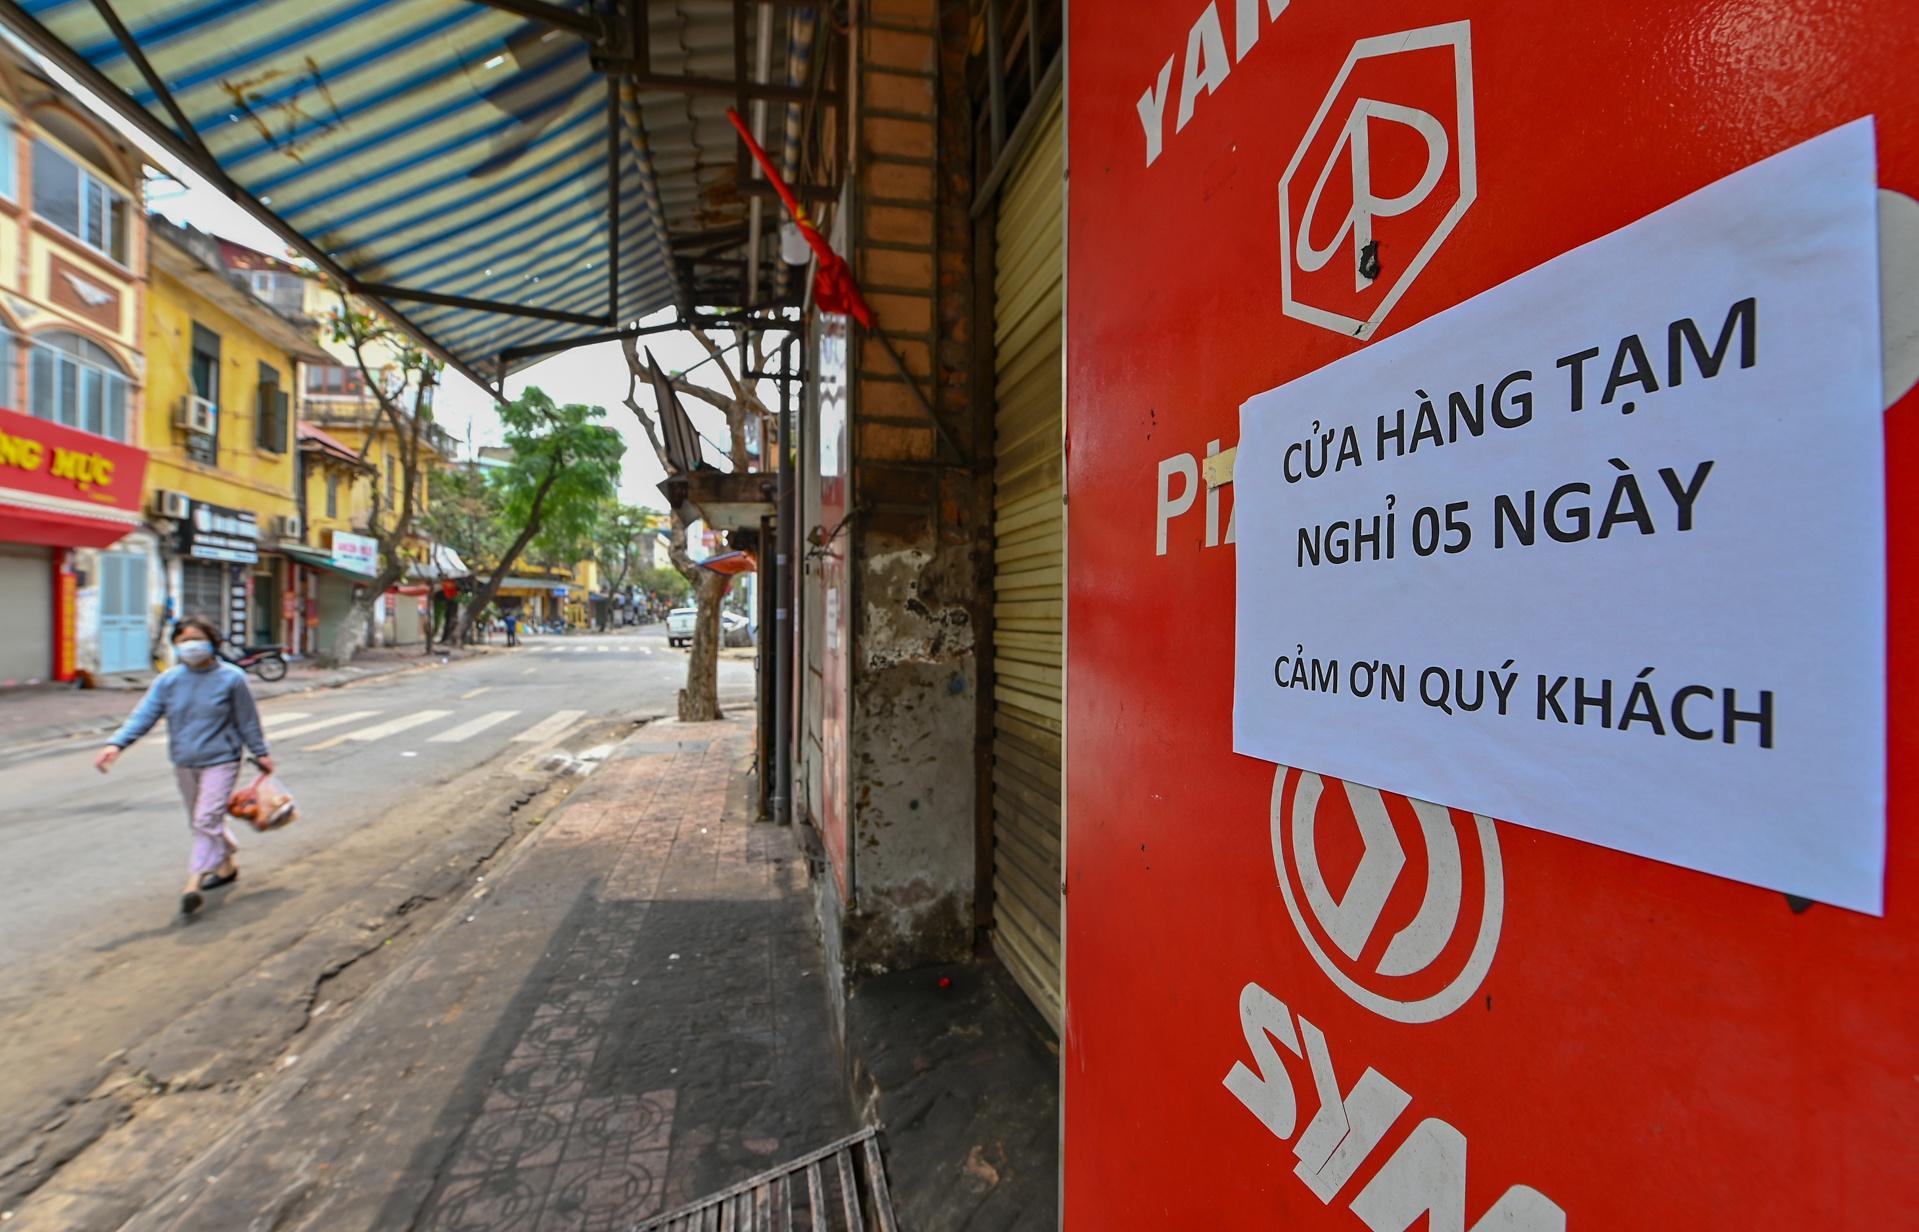 Duong pho Ha Noi vang nhu Tet vi dich Covid-19 hinh anh 5 hanoivangnhutet7_zing.jpg